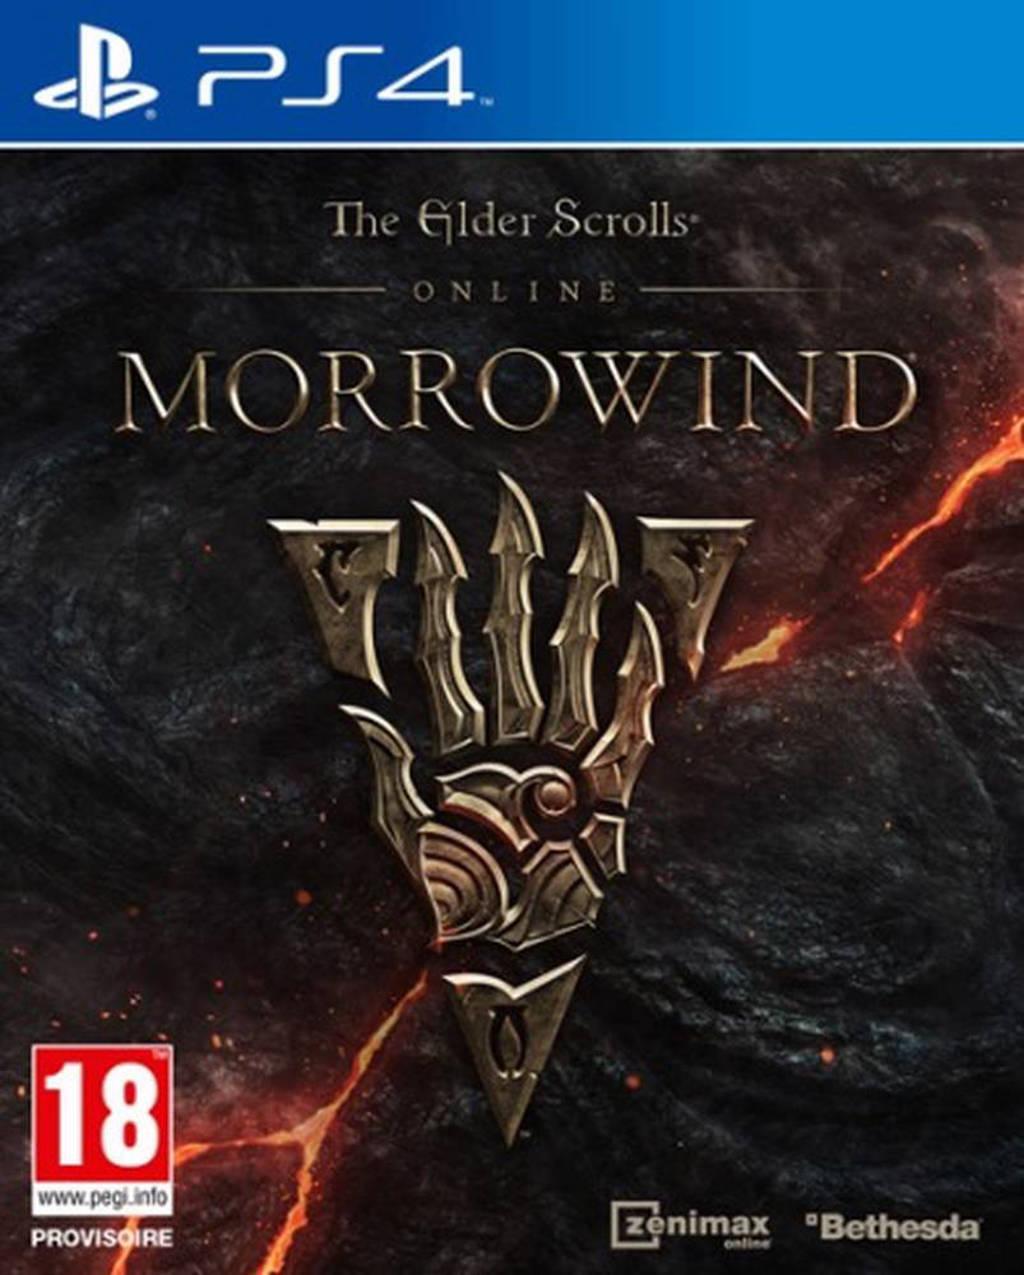 Elder scrolls online - Morrowind (PlayStation 4)